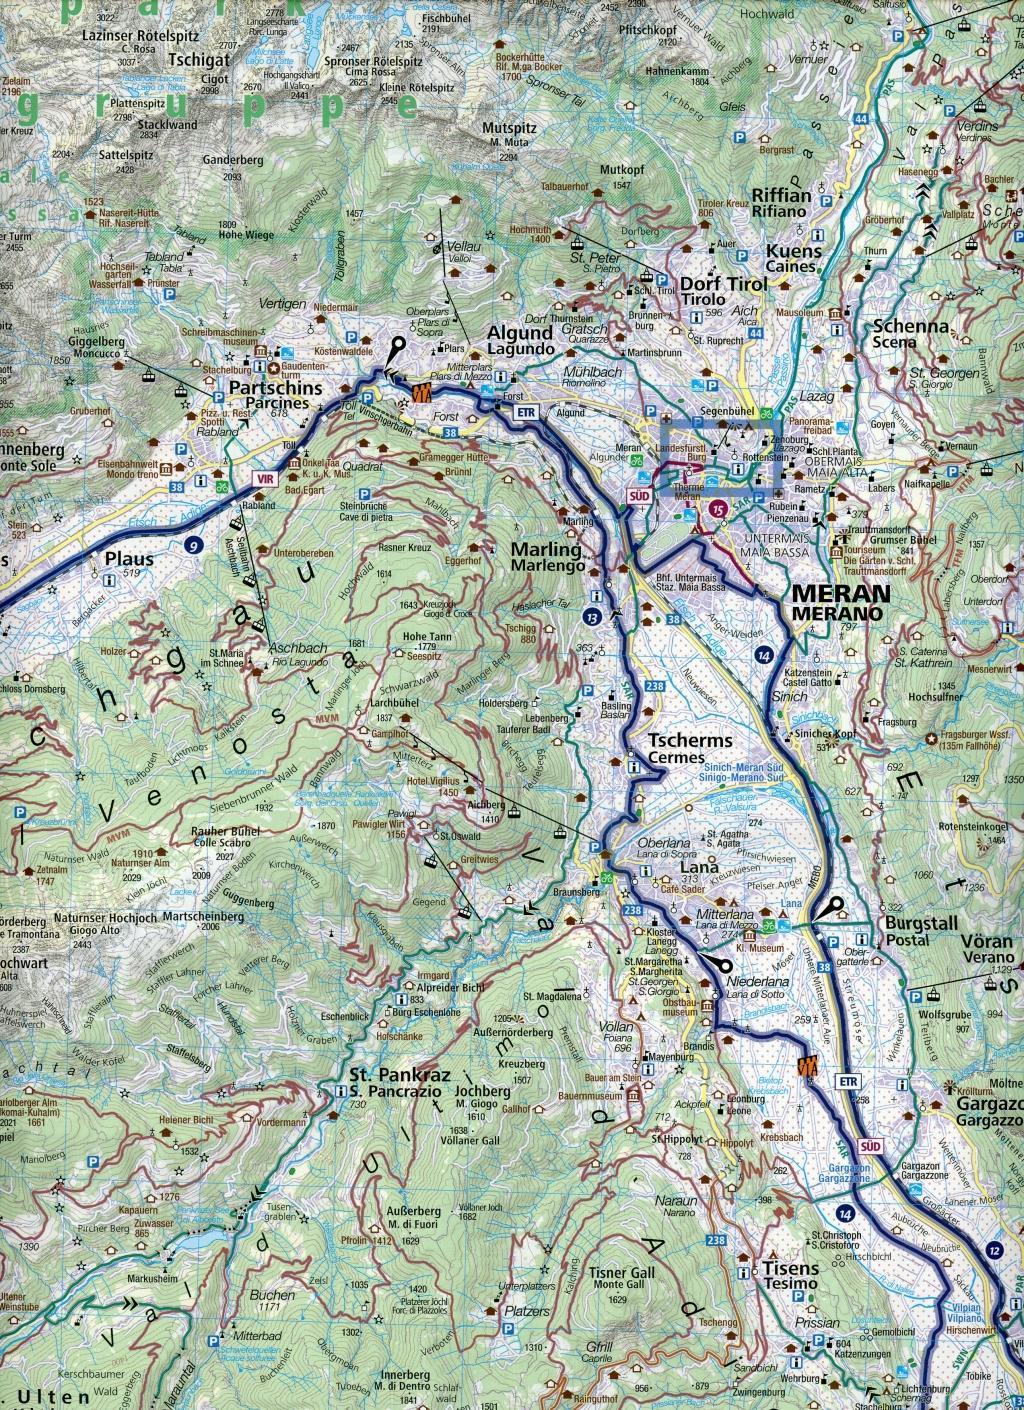 KOMPASS Fahrradkarte Meran, Bozen und Umgebung, Merano, Bolzano